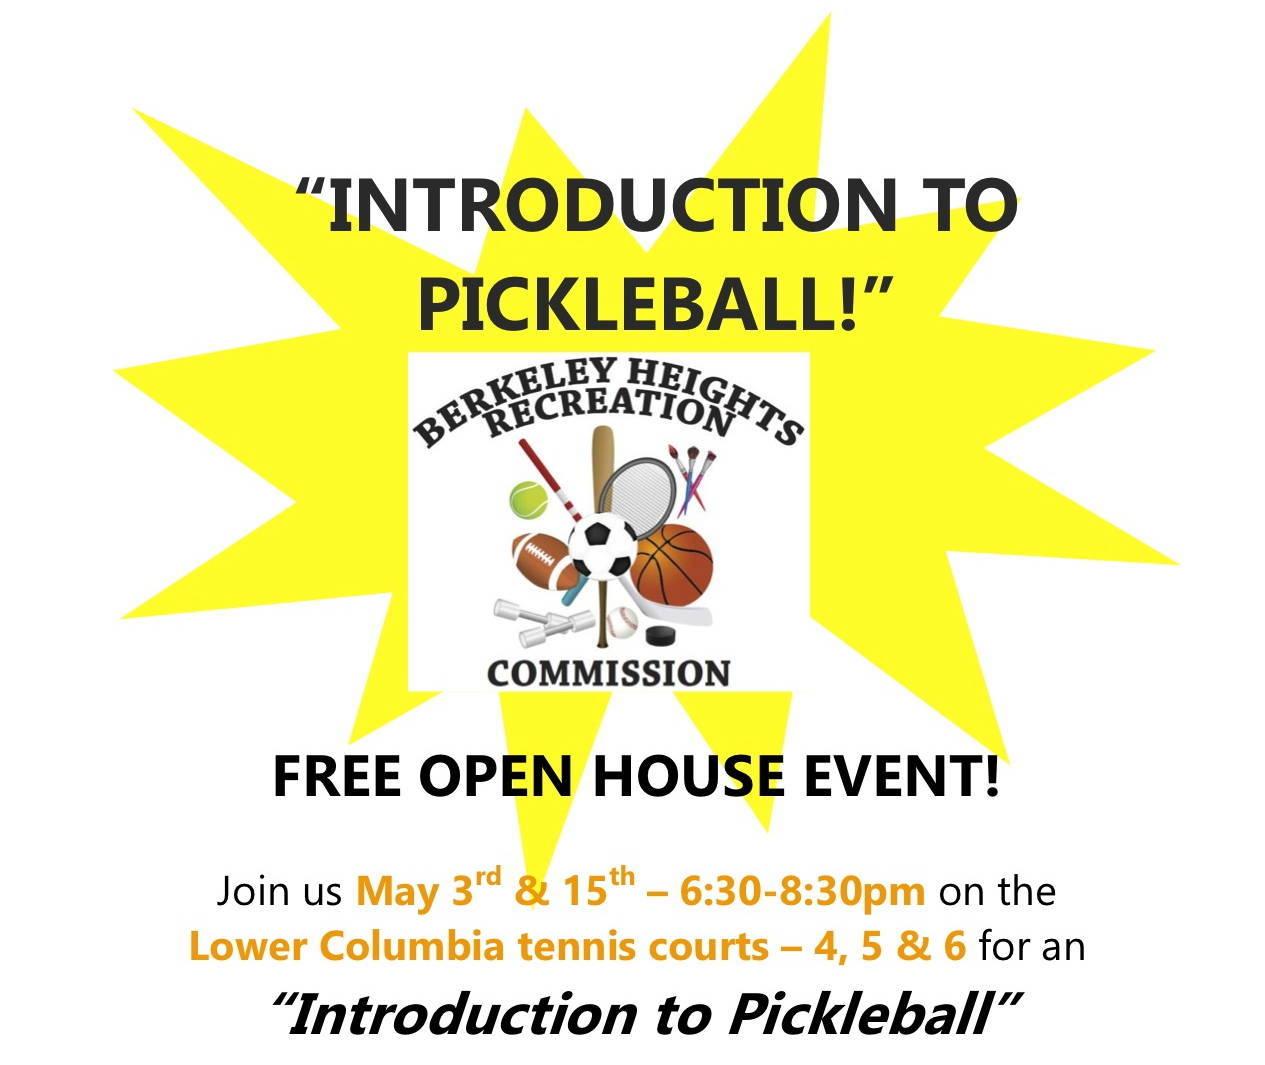 61b0306e4f9b09fddd10_Introduction_to_pickleball_flyer_1_2018.jpg